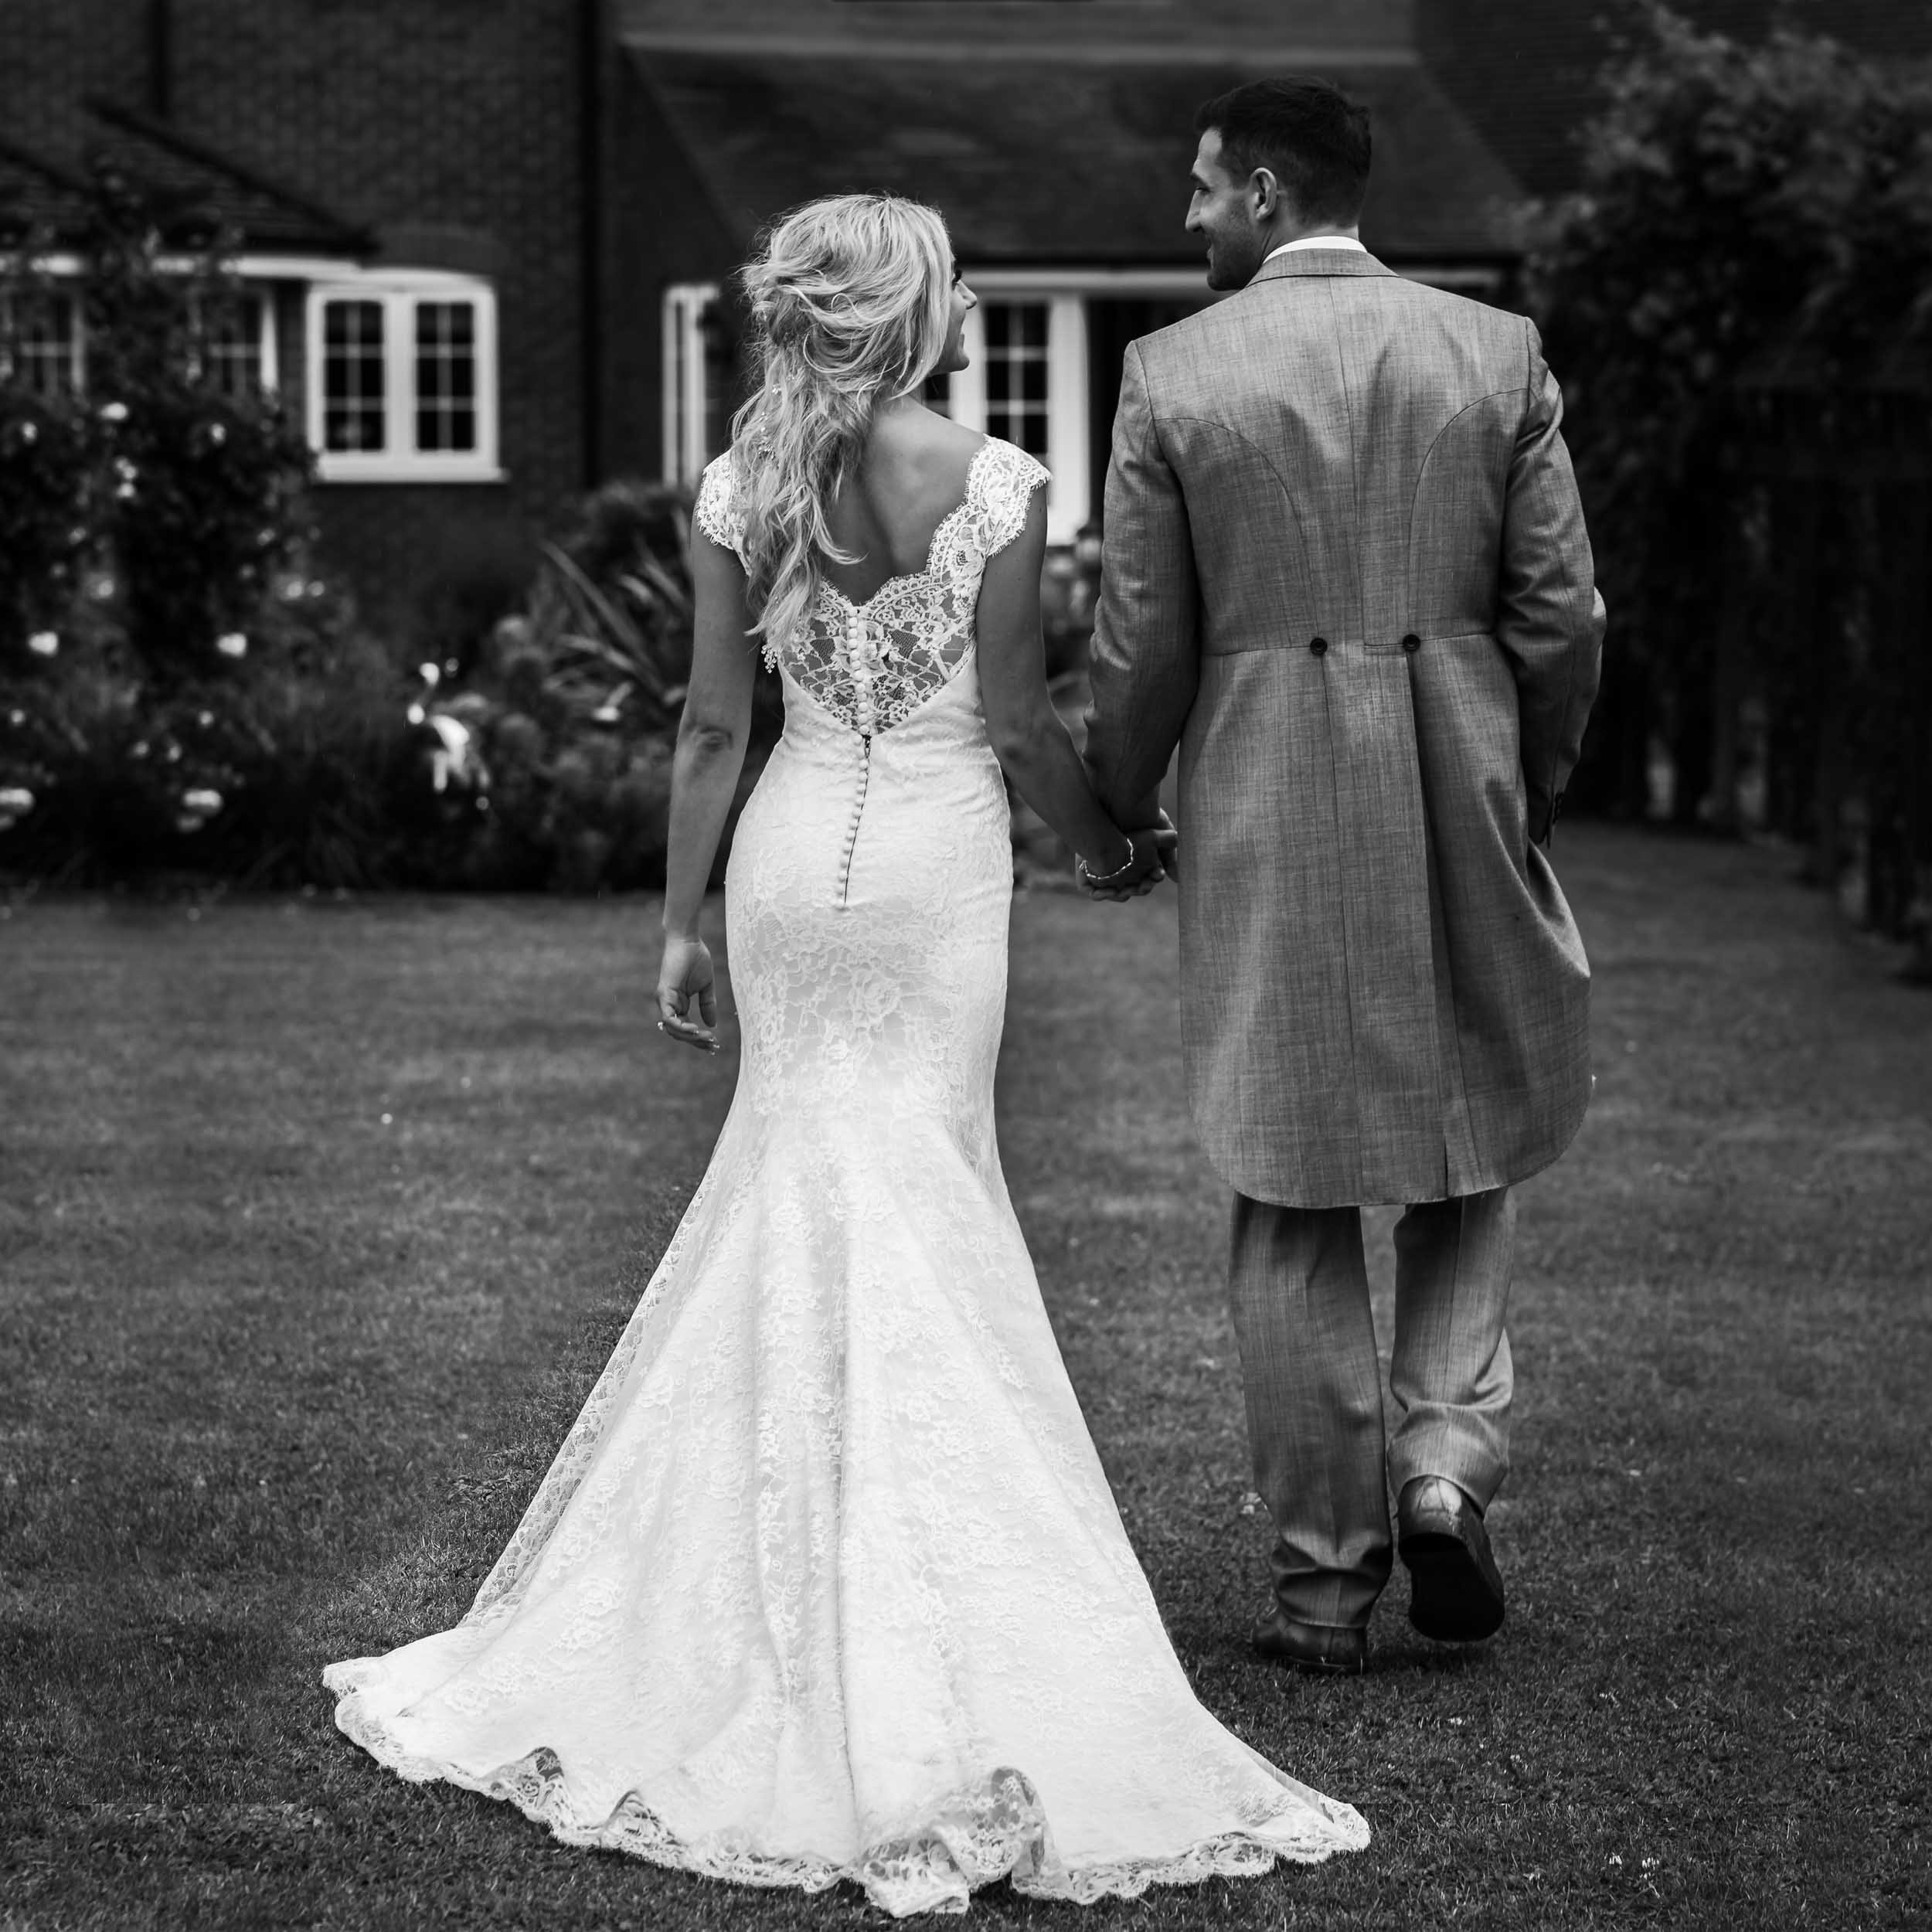 NC-20170722-sophie-and-jonny-wedding-0498-Edit.jpg